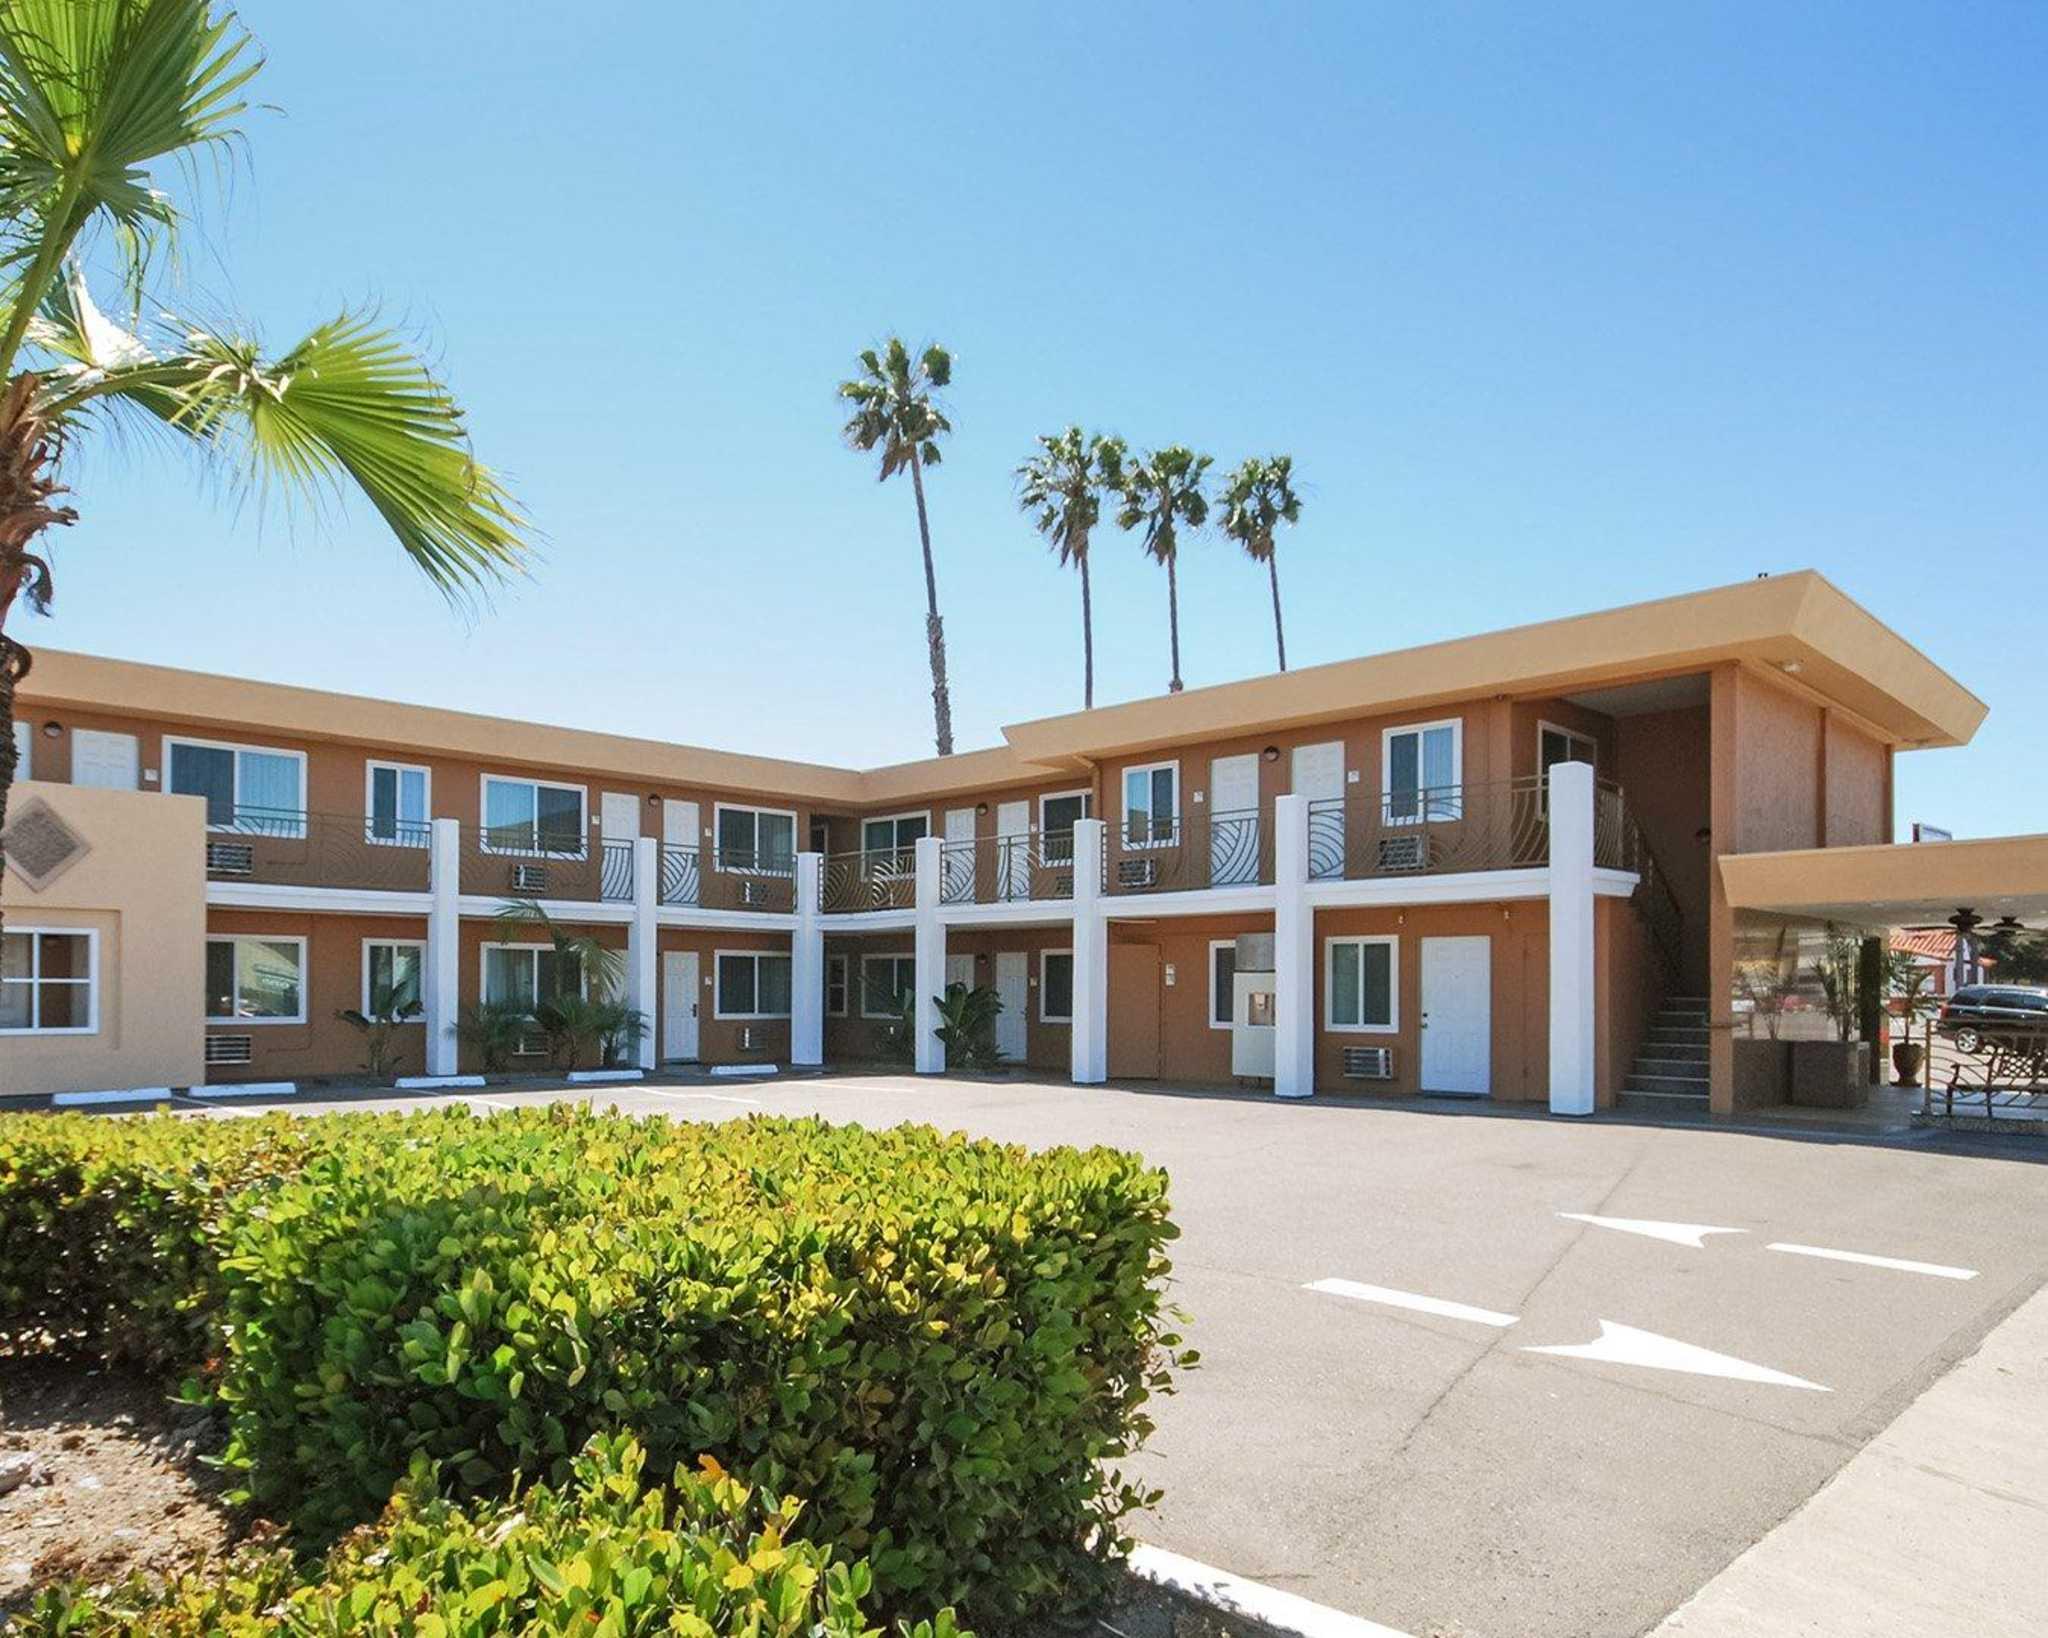 Comfort Inn San Diego At The Harbor image 1